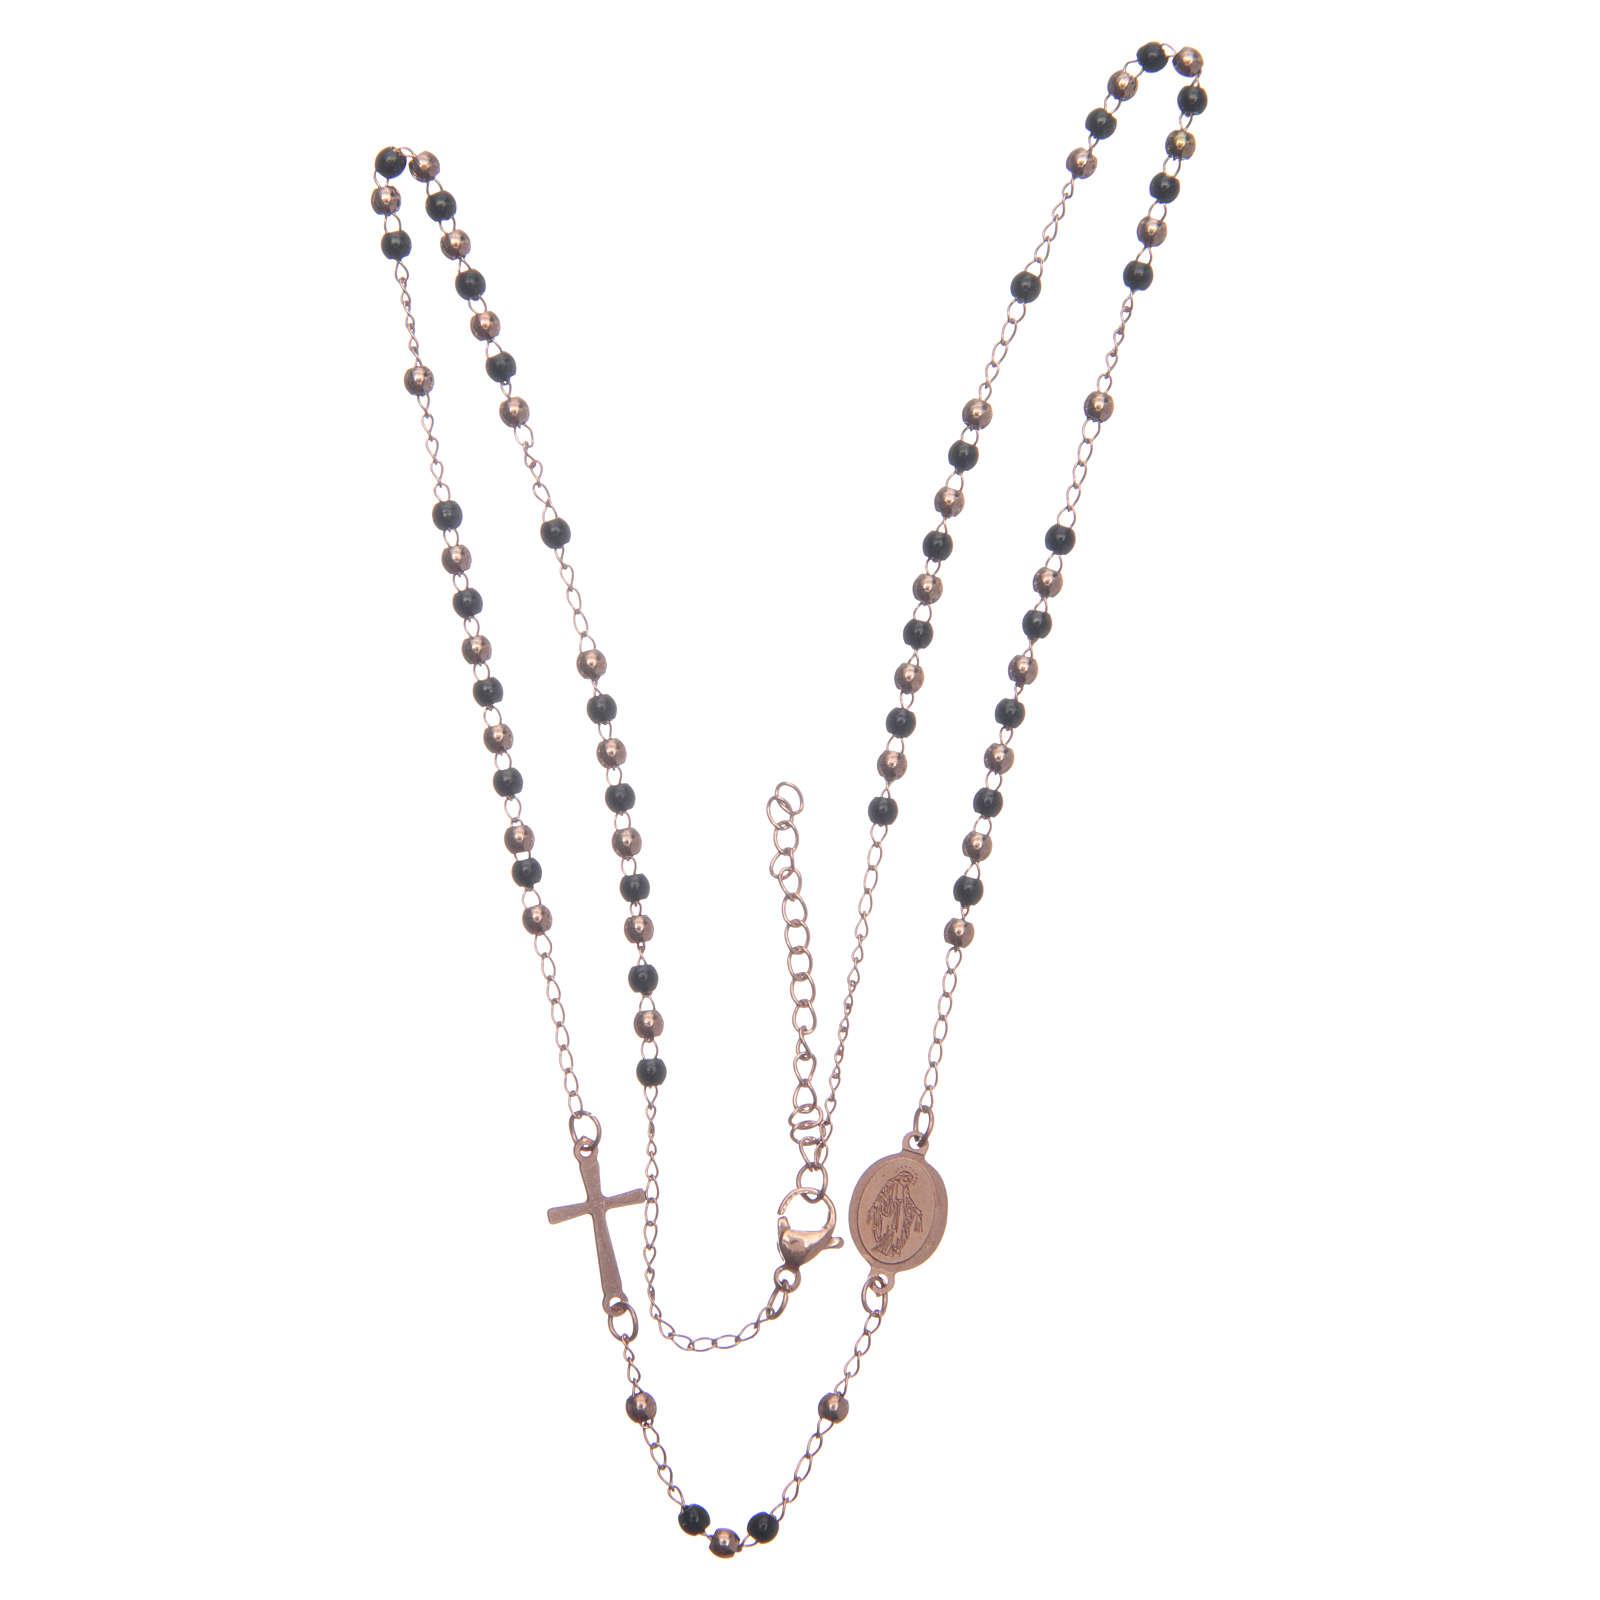 Rosary choker rosè and black 316L steel 4